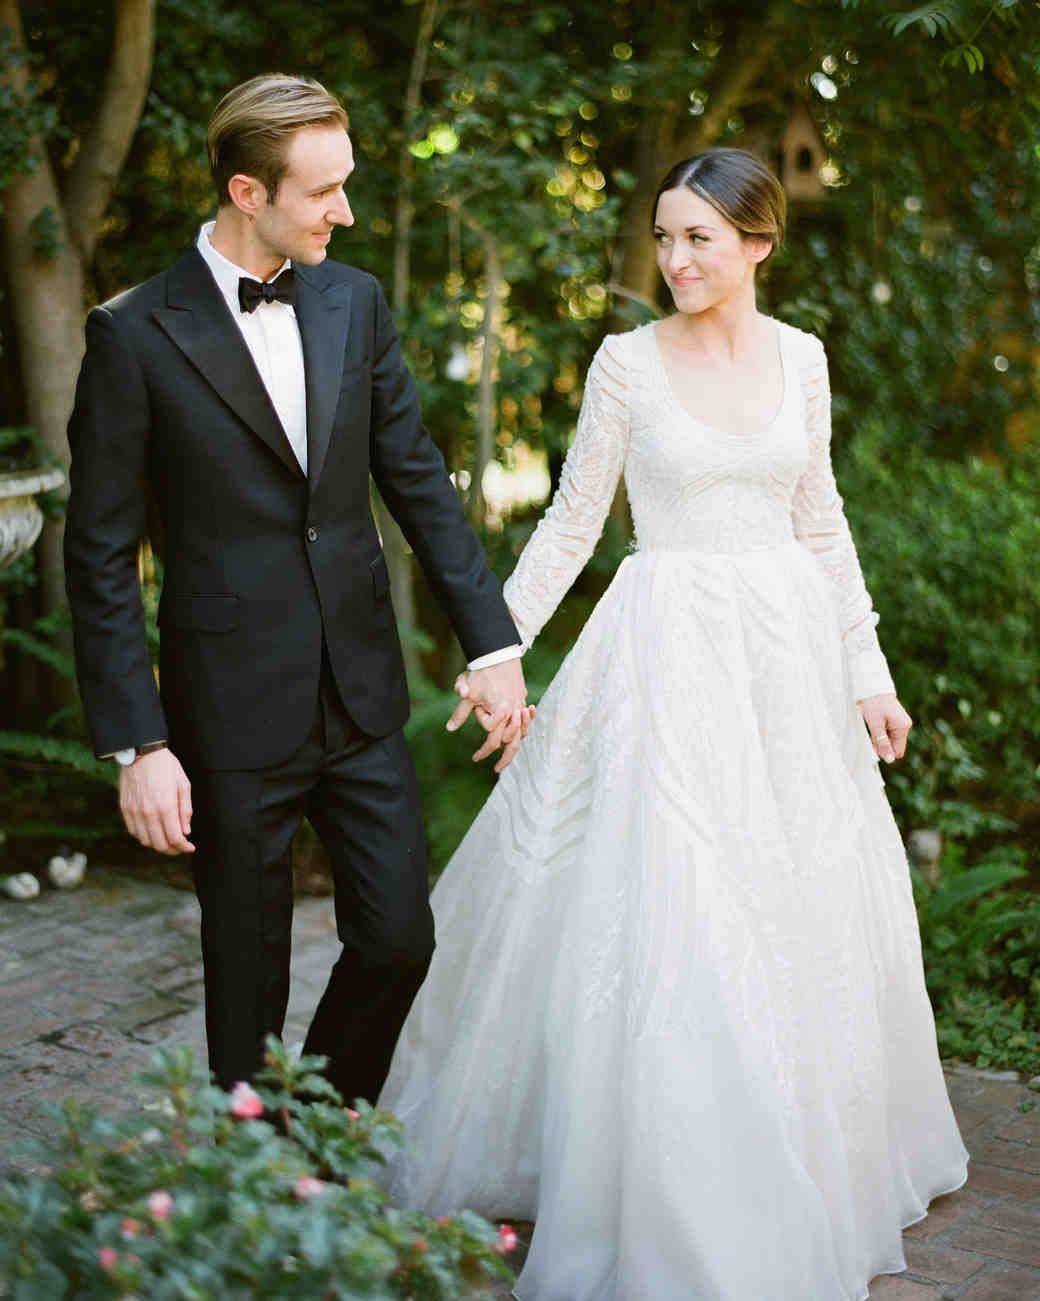 a backyard, garden wedding in san marino | martha stewart weddings